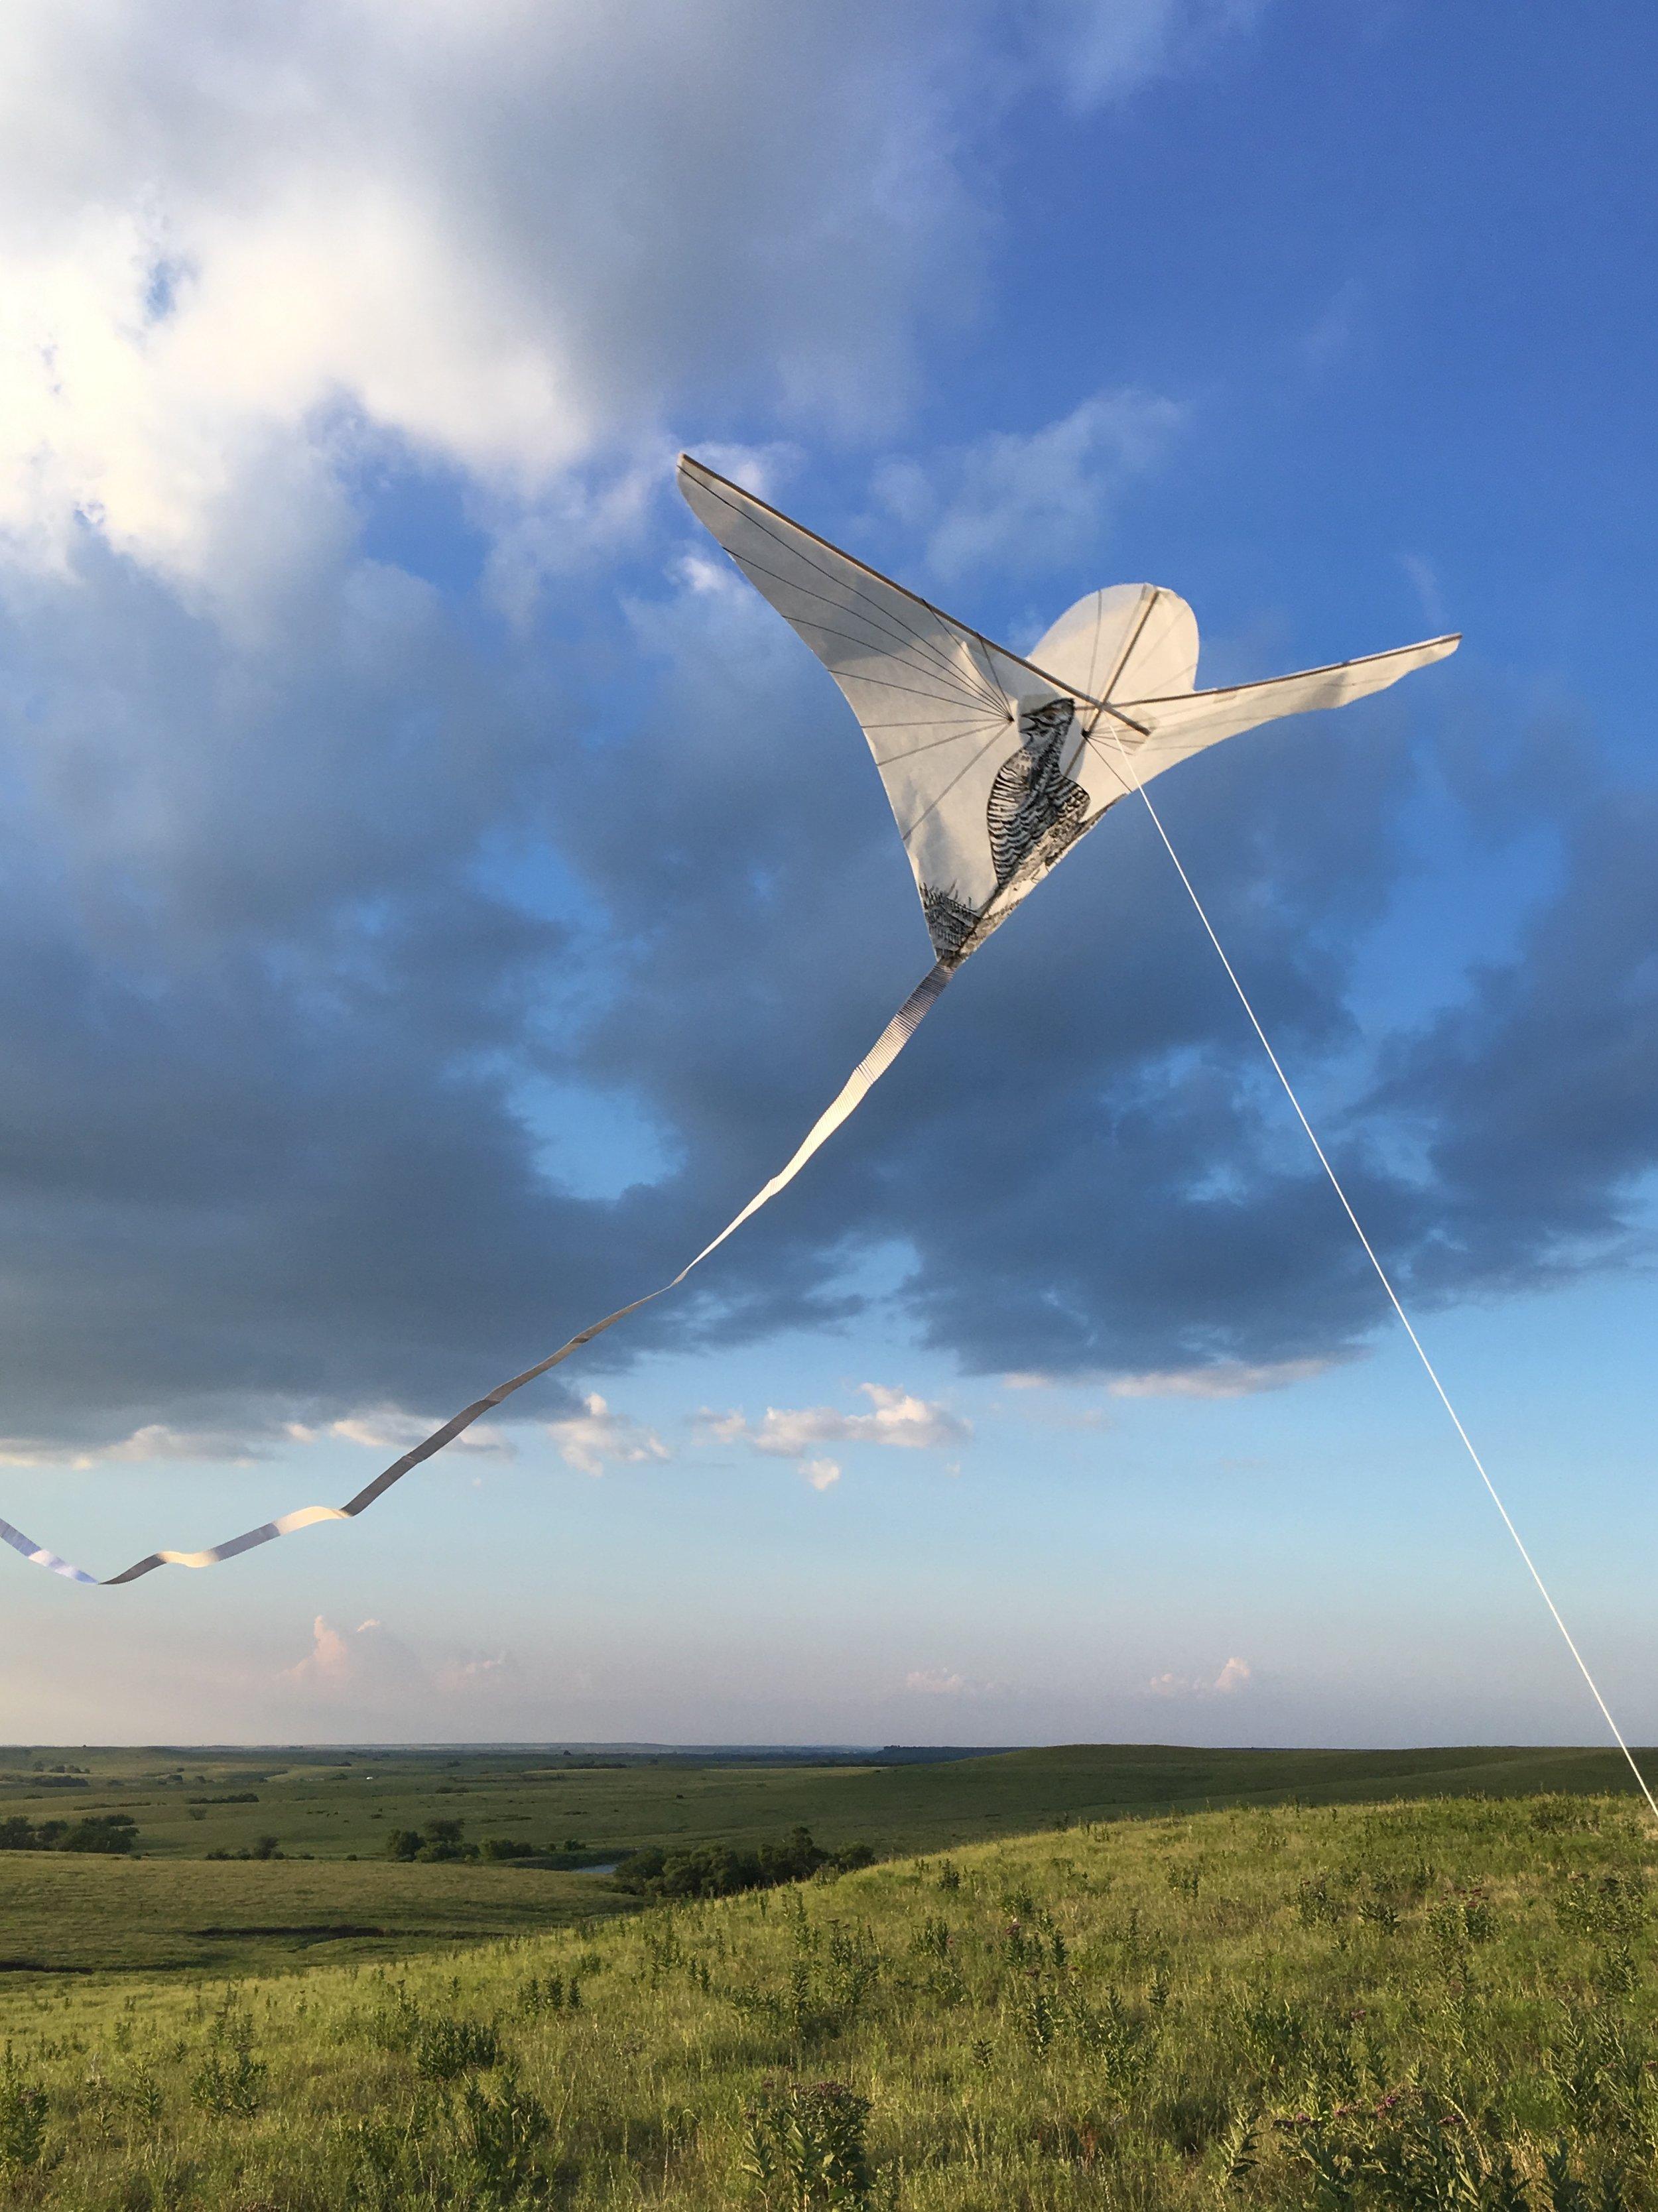 Chicken kite at the park